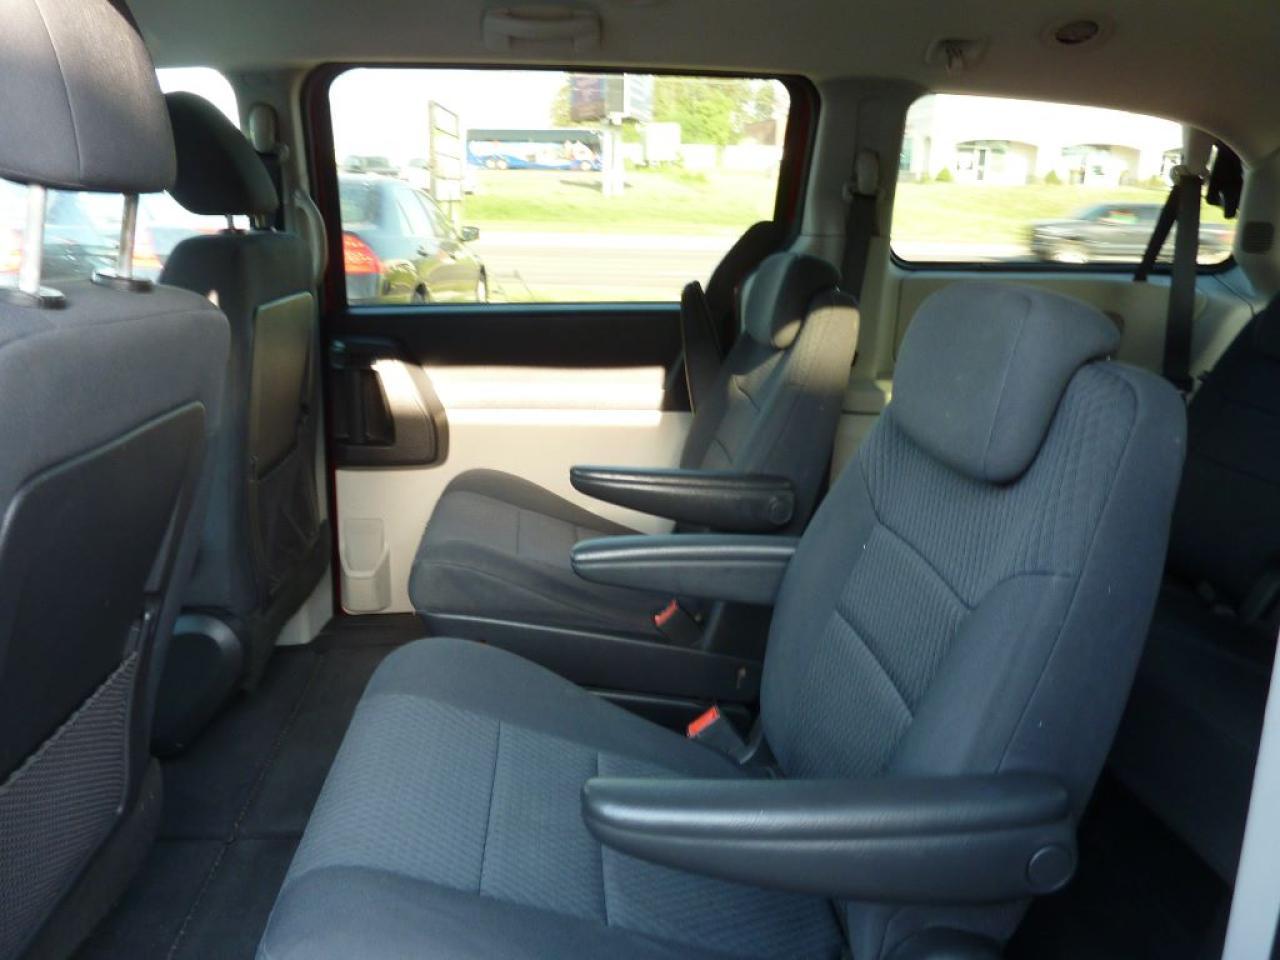 2010 Dodge Grand Caravan SE,Stow & Go with DVD